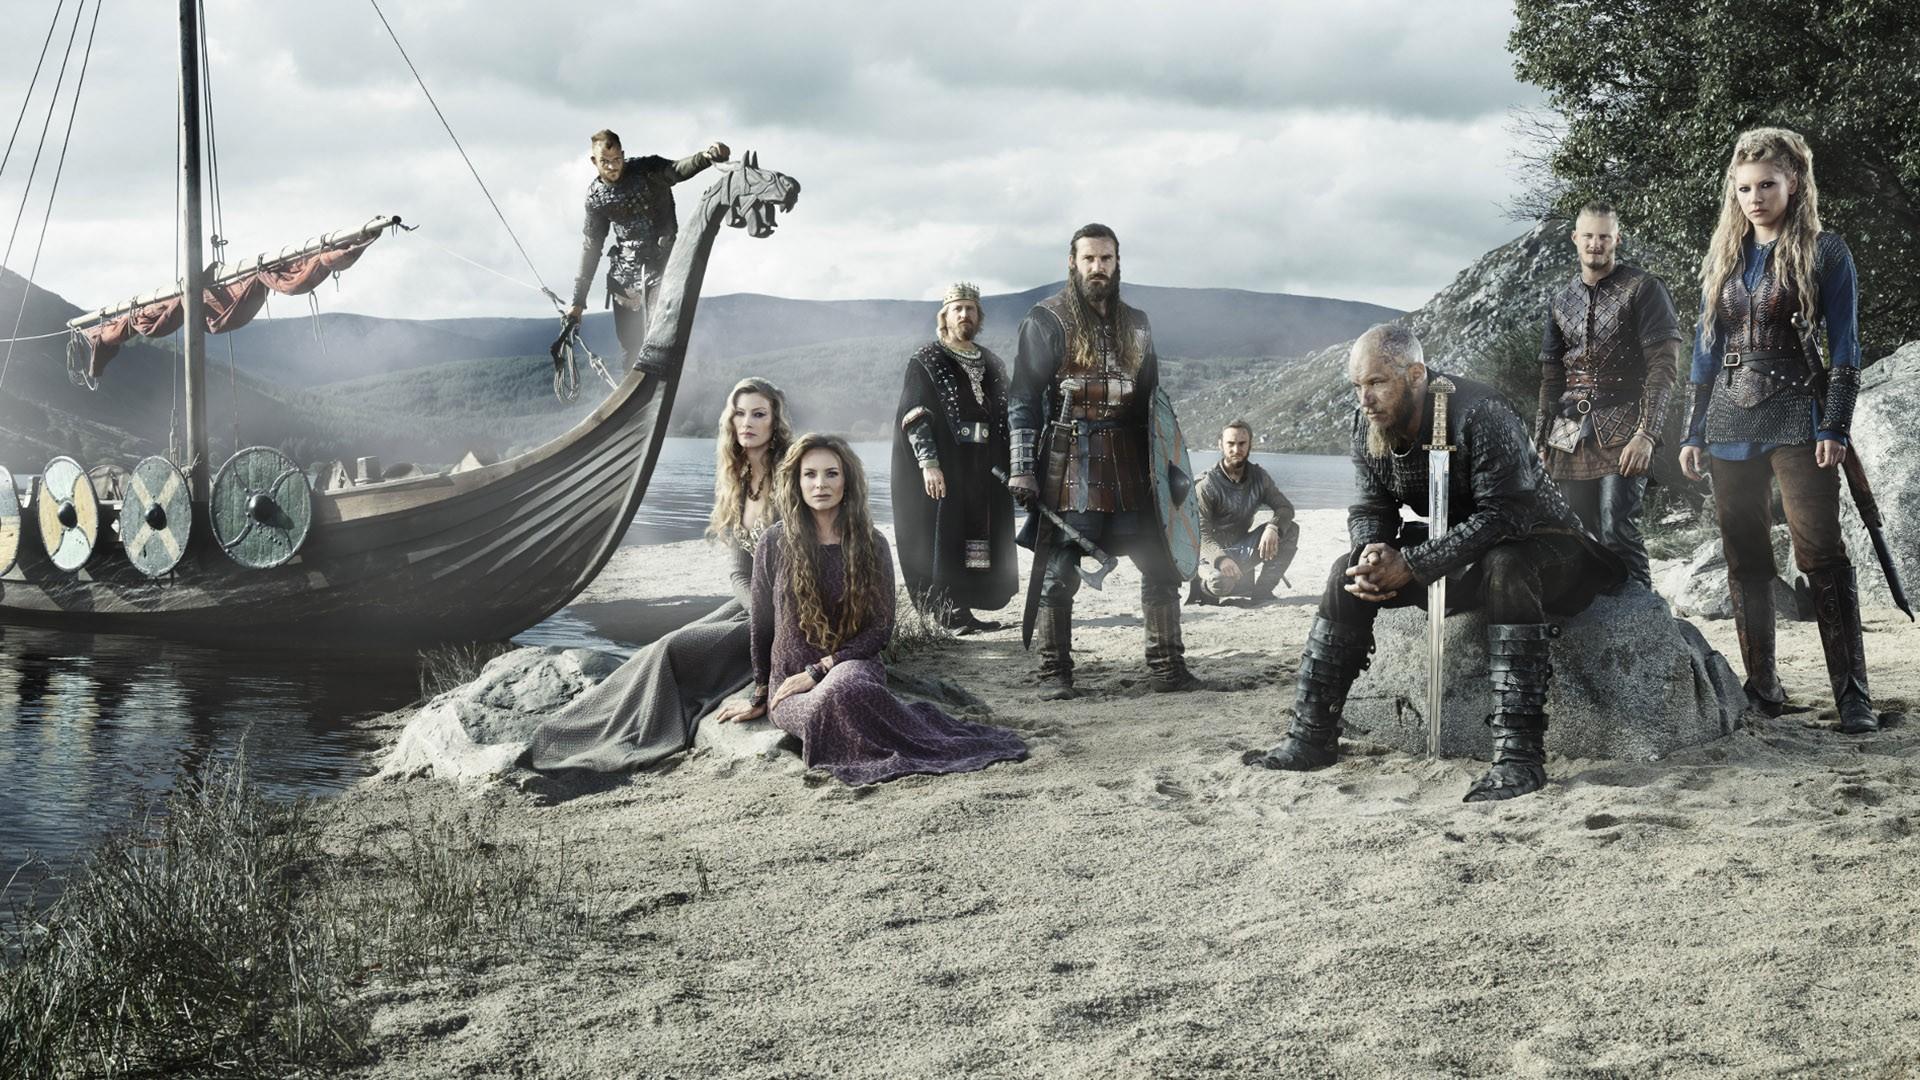 Download Vikings 2015 Canadian Tv Series Poster HD Wallpaper Search 1920x1080